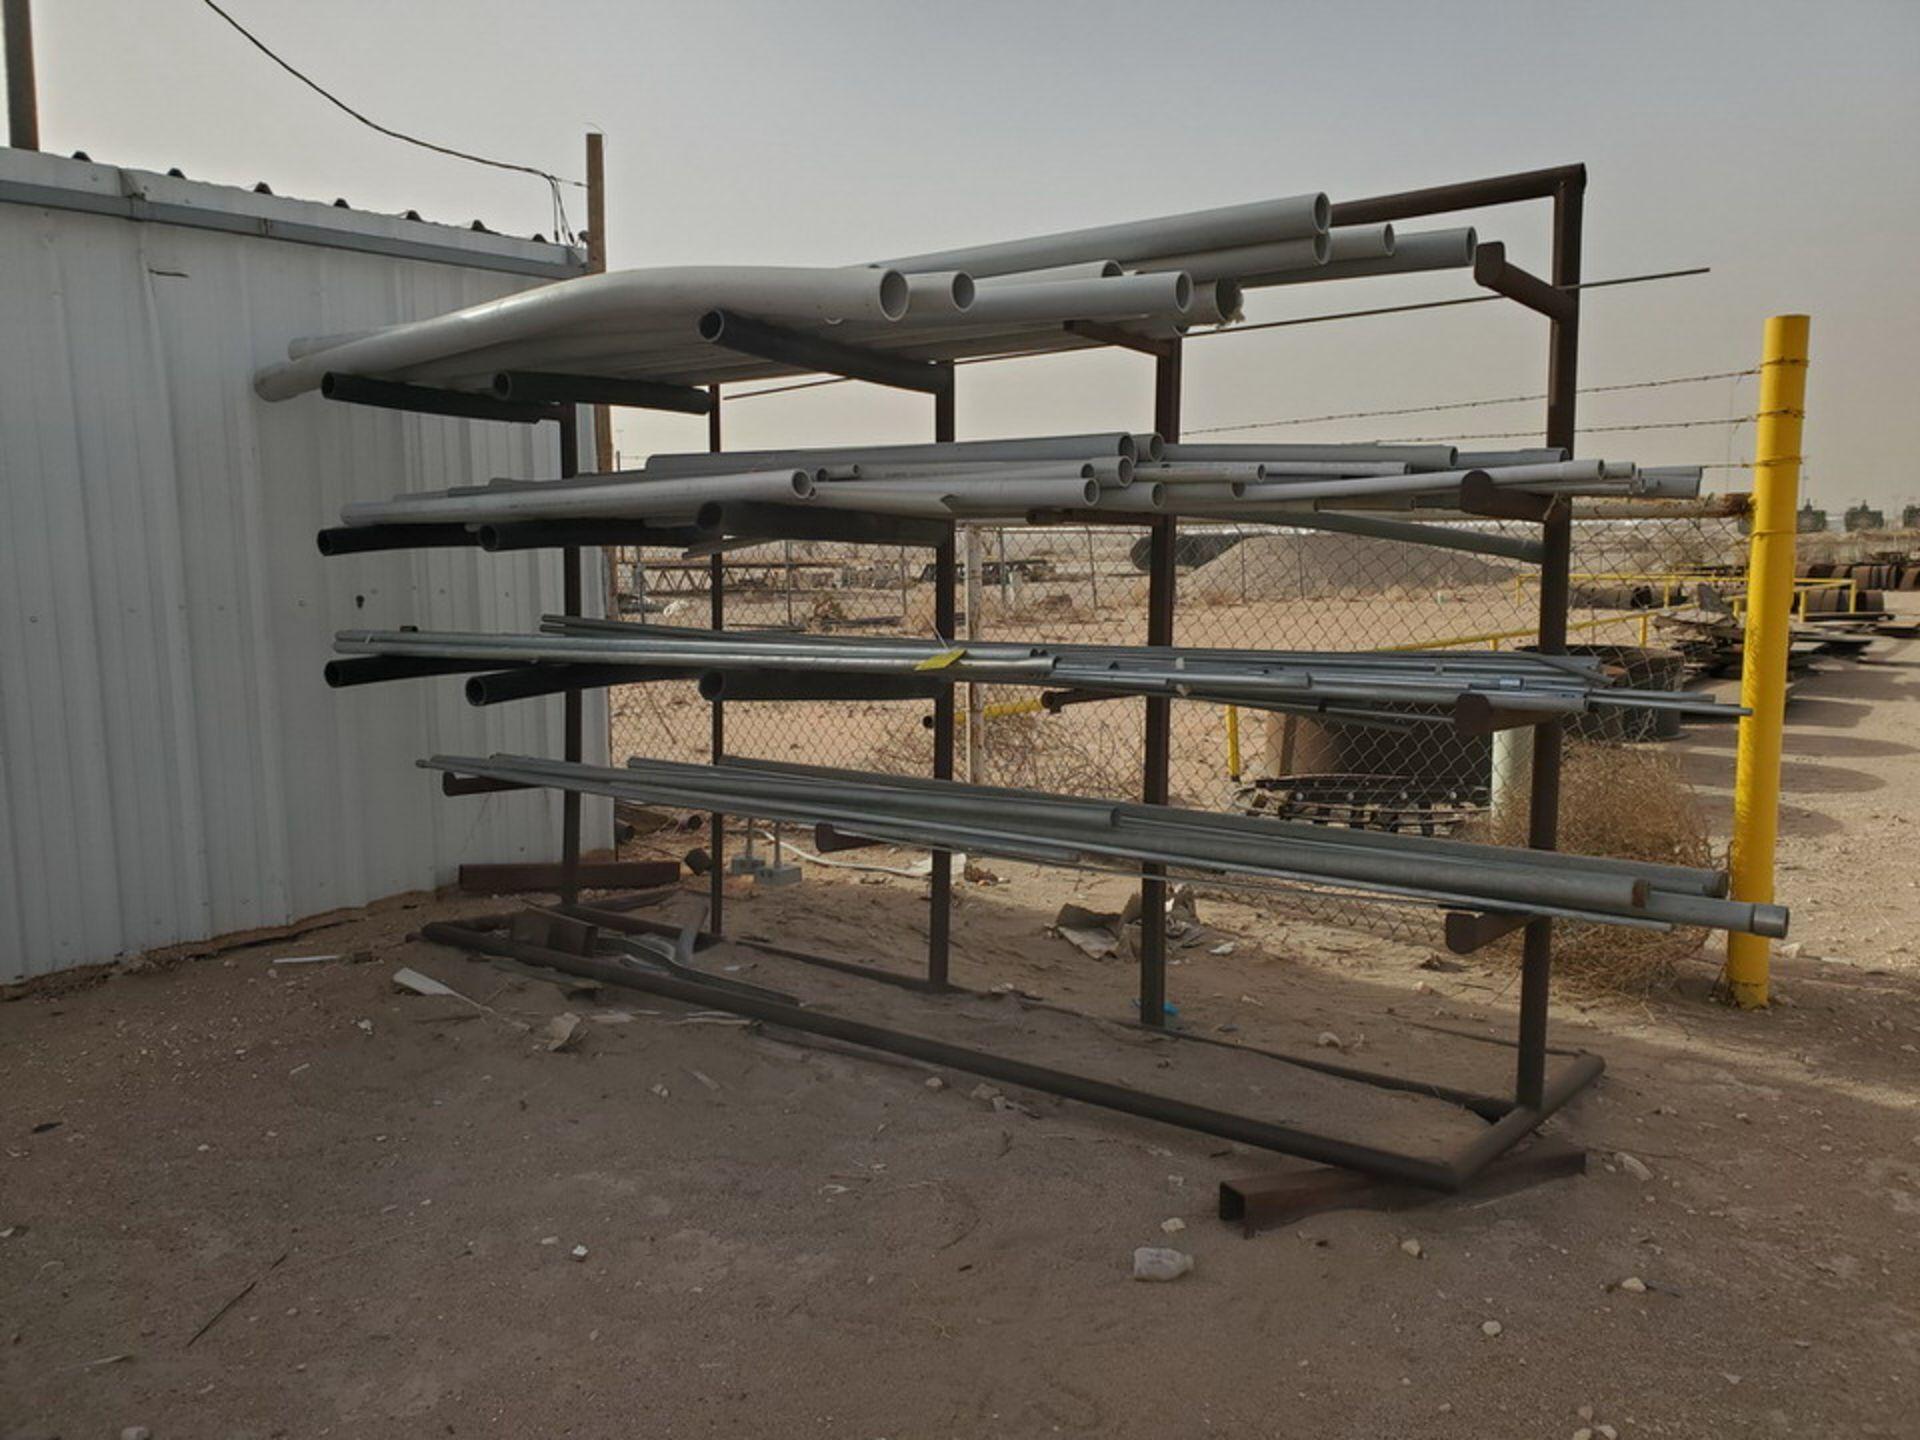 "PVC & Alum. Pipe W/ Conduit Size Range: 1/2"" - 4"" W/ Rack"